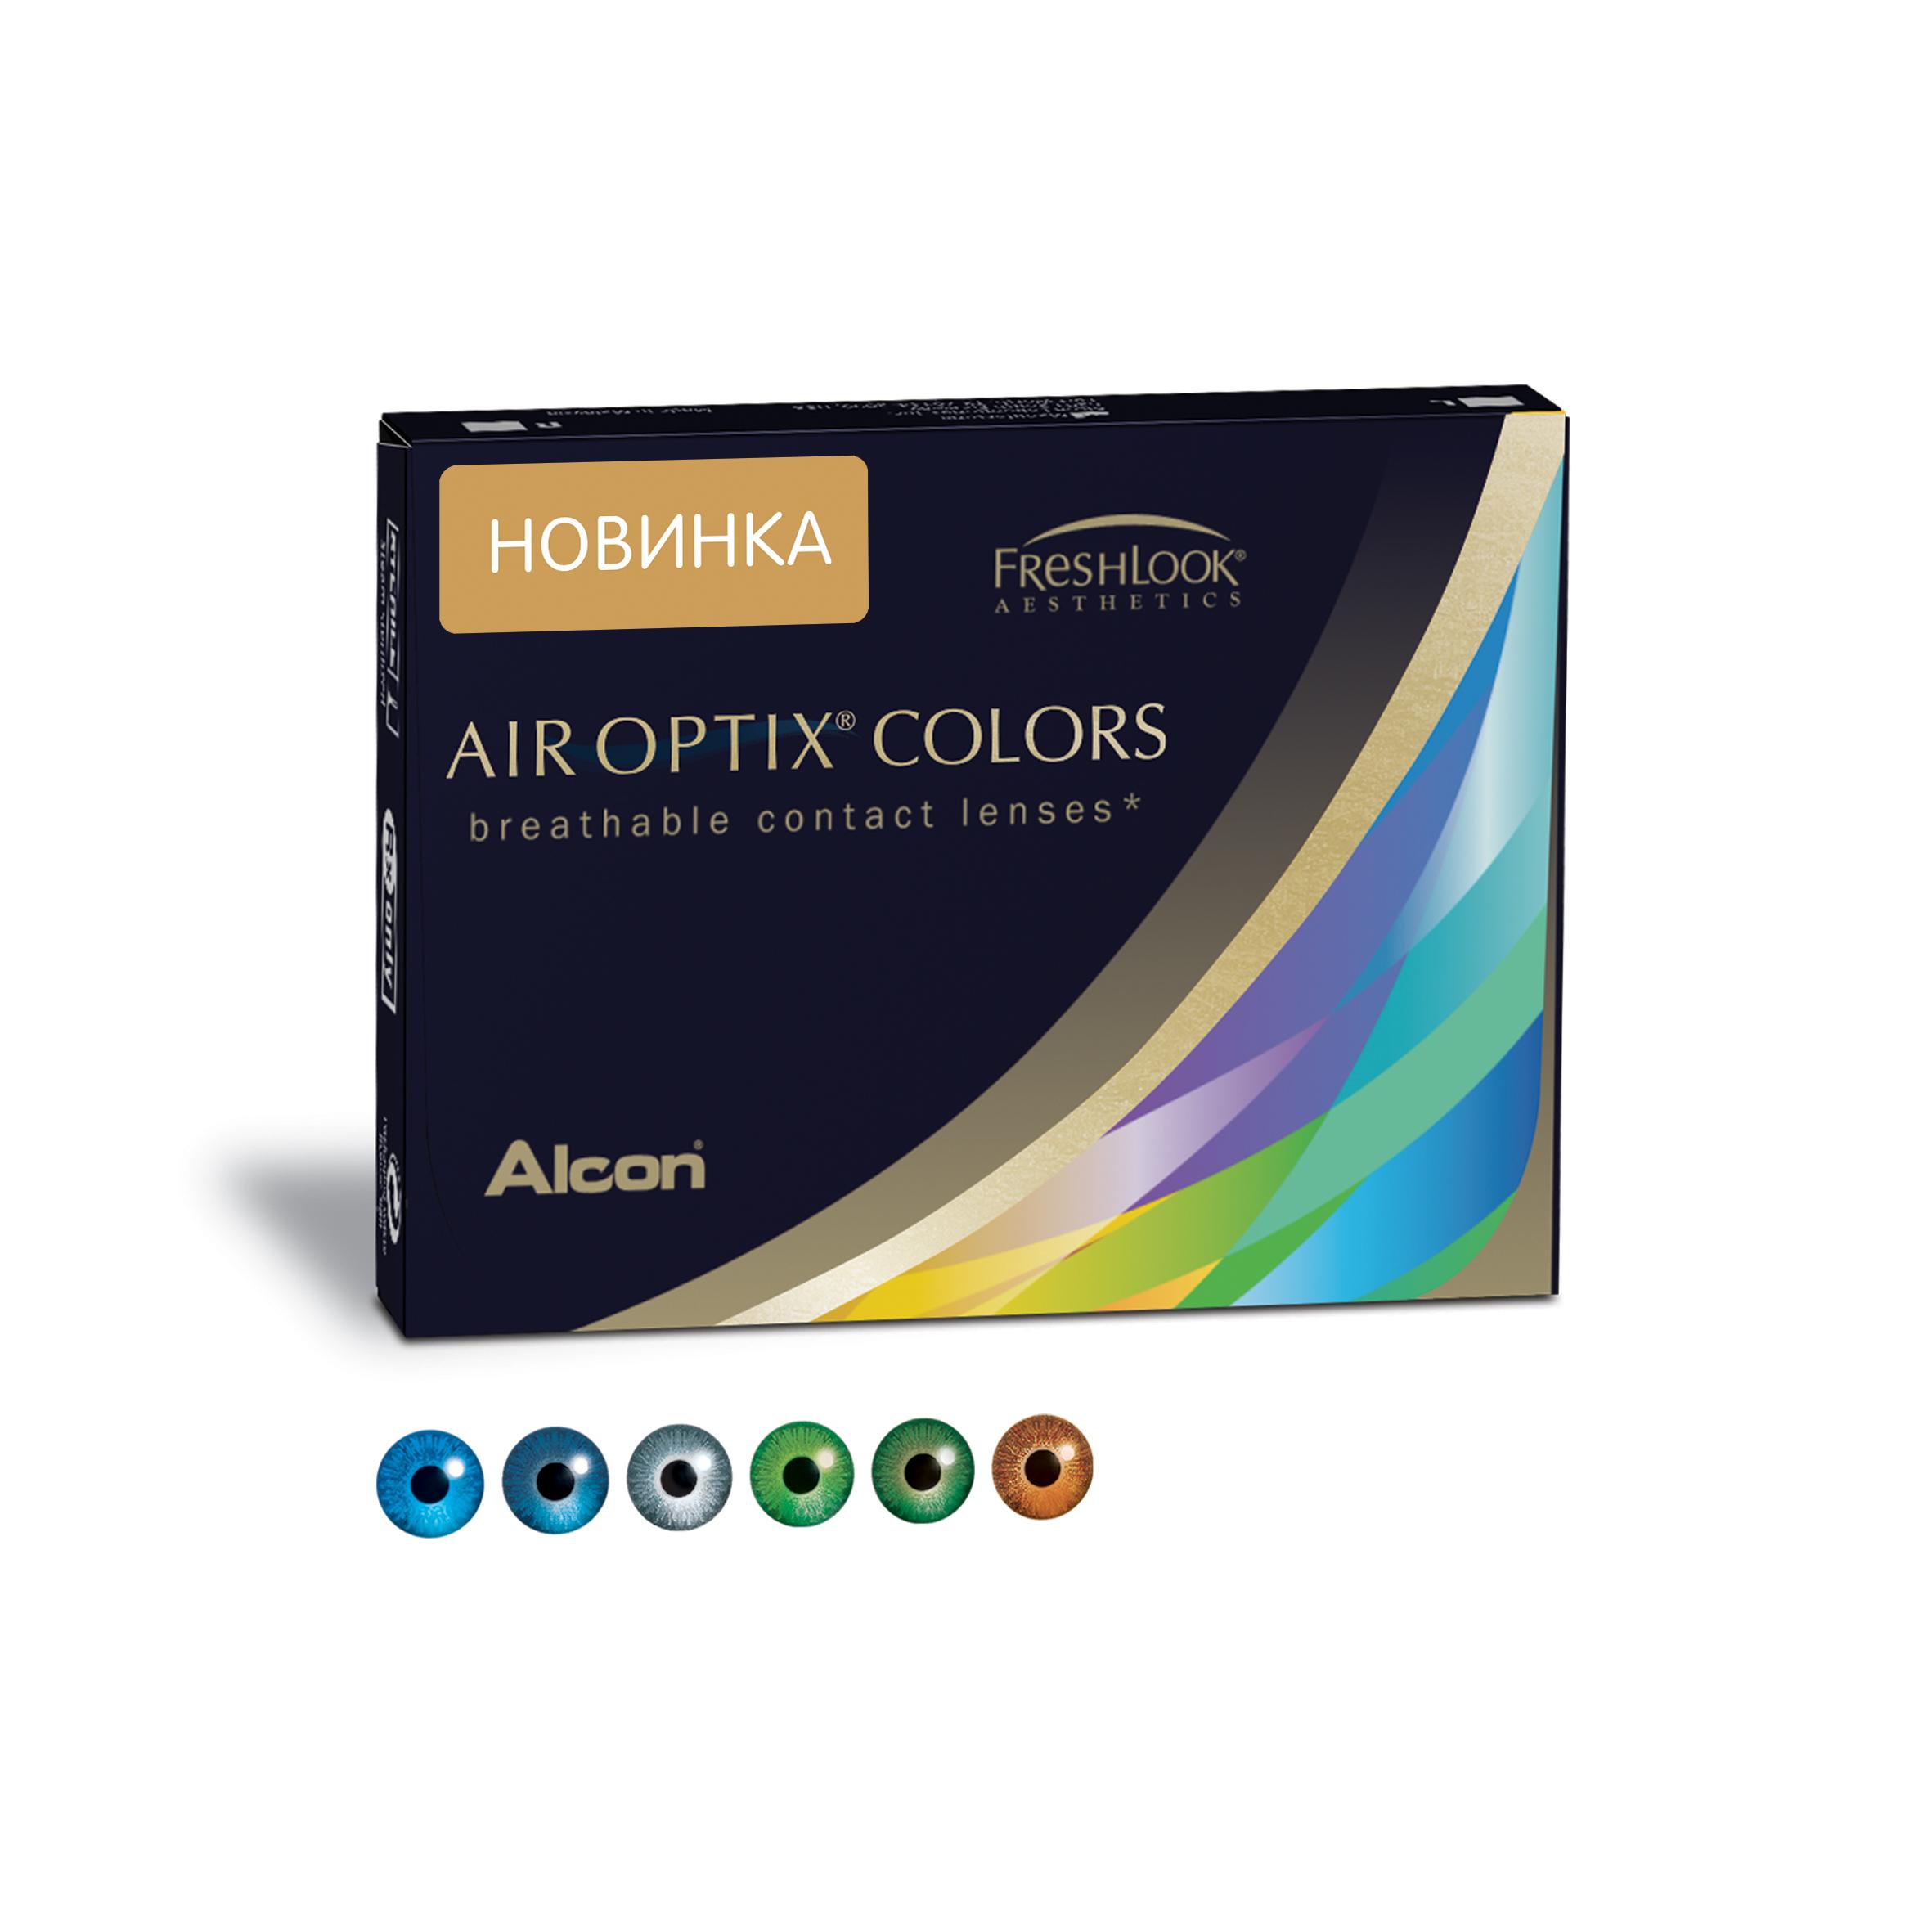 Аlcon контактные линзы Air Optix Colors 2 шт -1.25 Sterling Gray31746138Мягкие контактные линзы